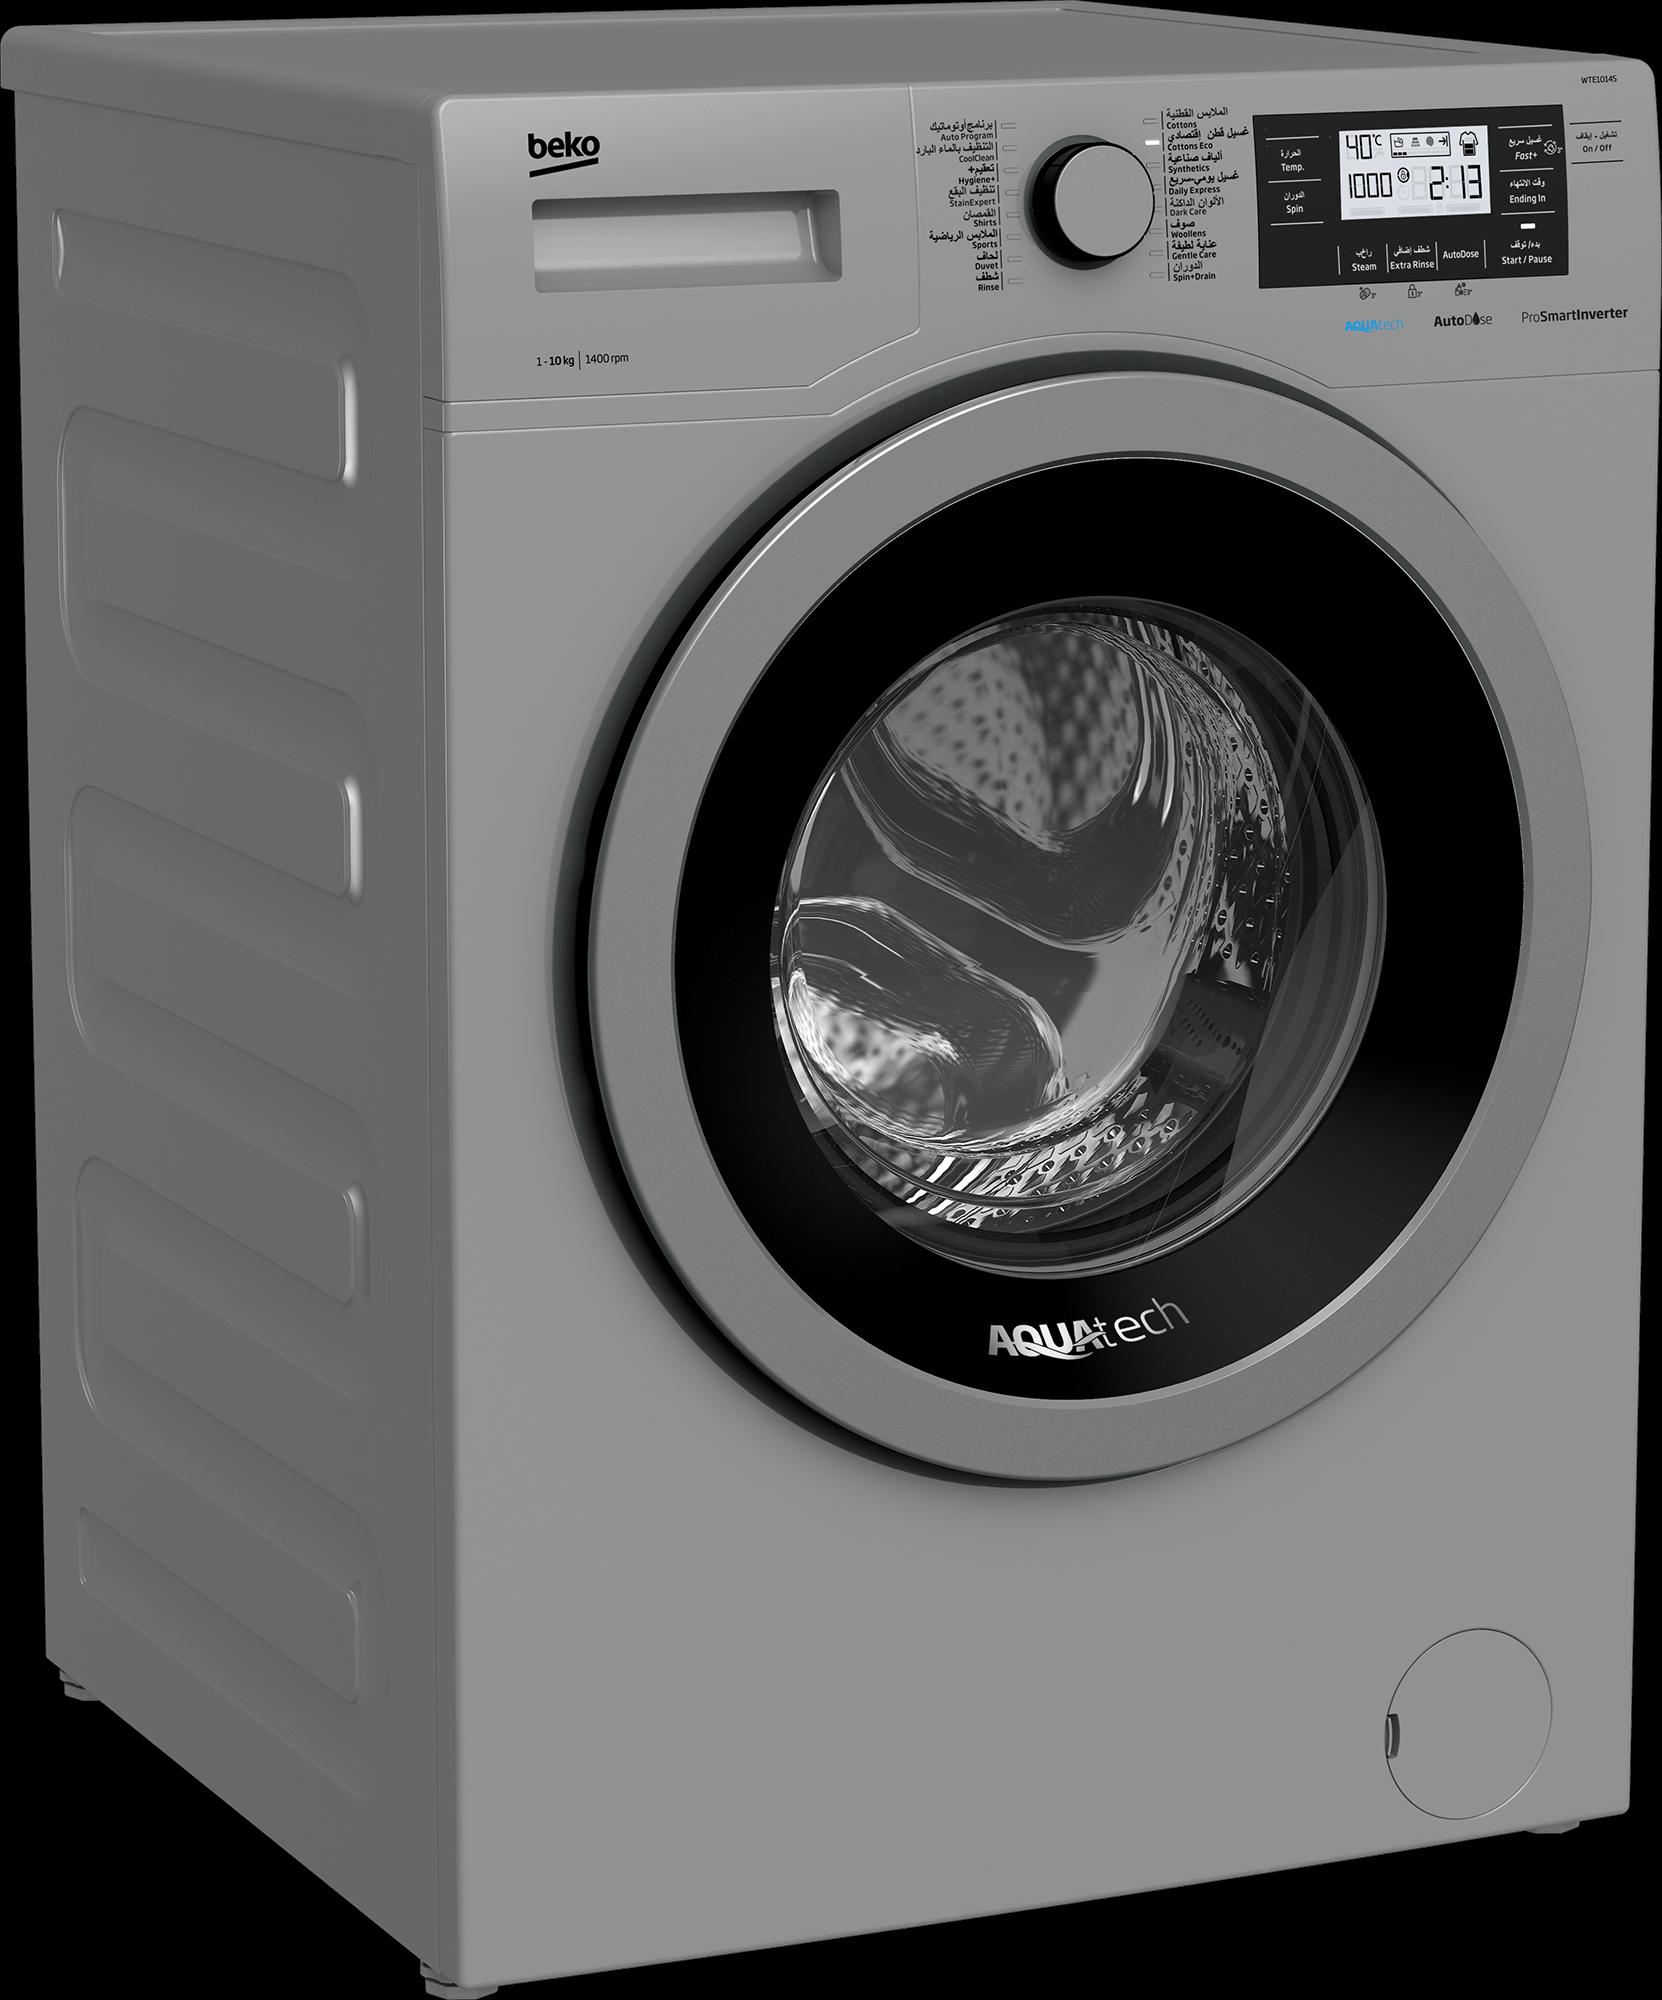 BEKO 10Kg Front Load Washing Machine WTE1014S